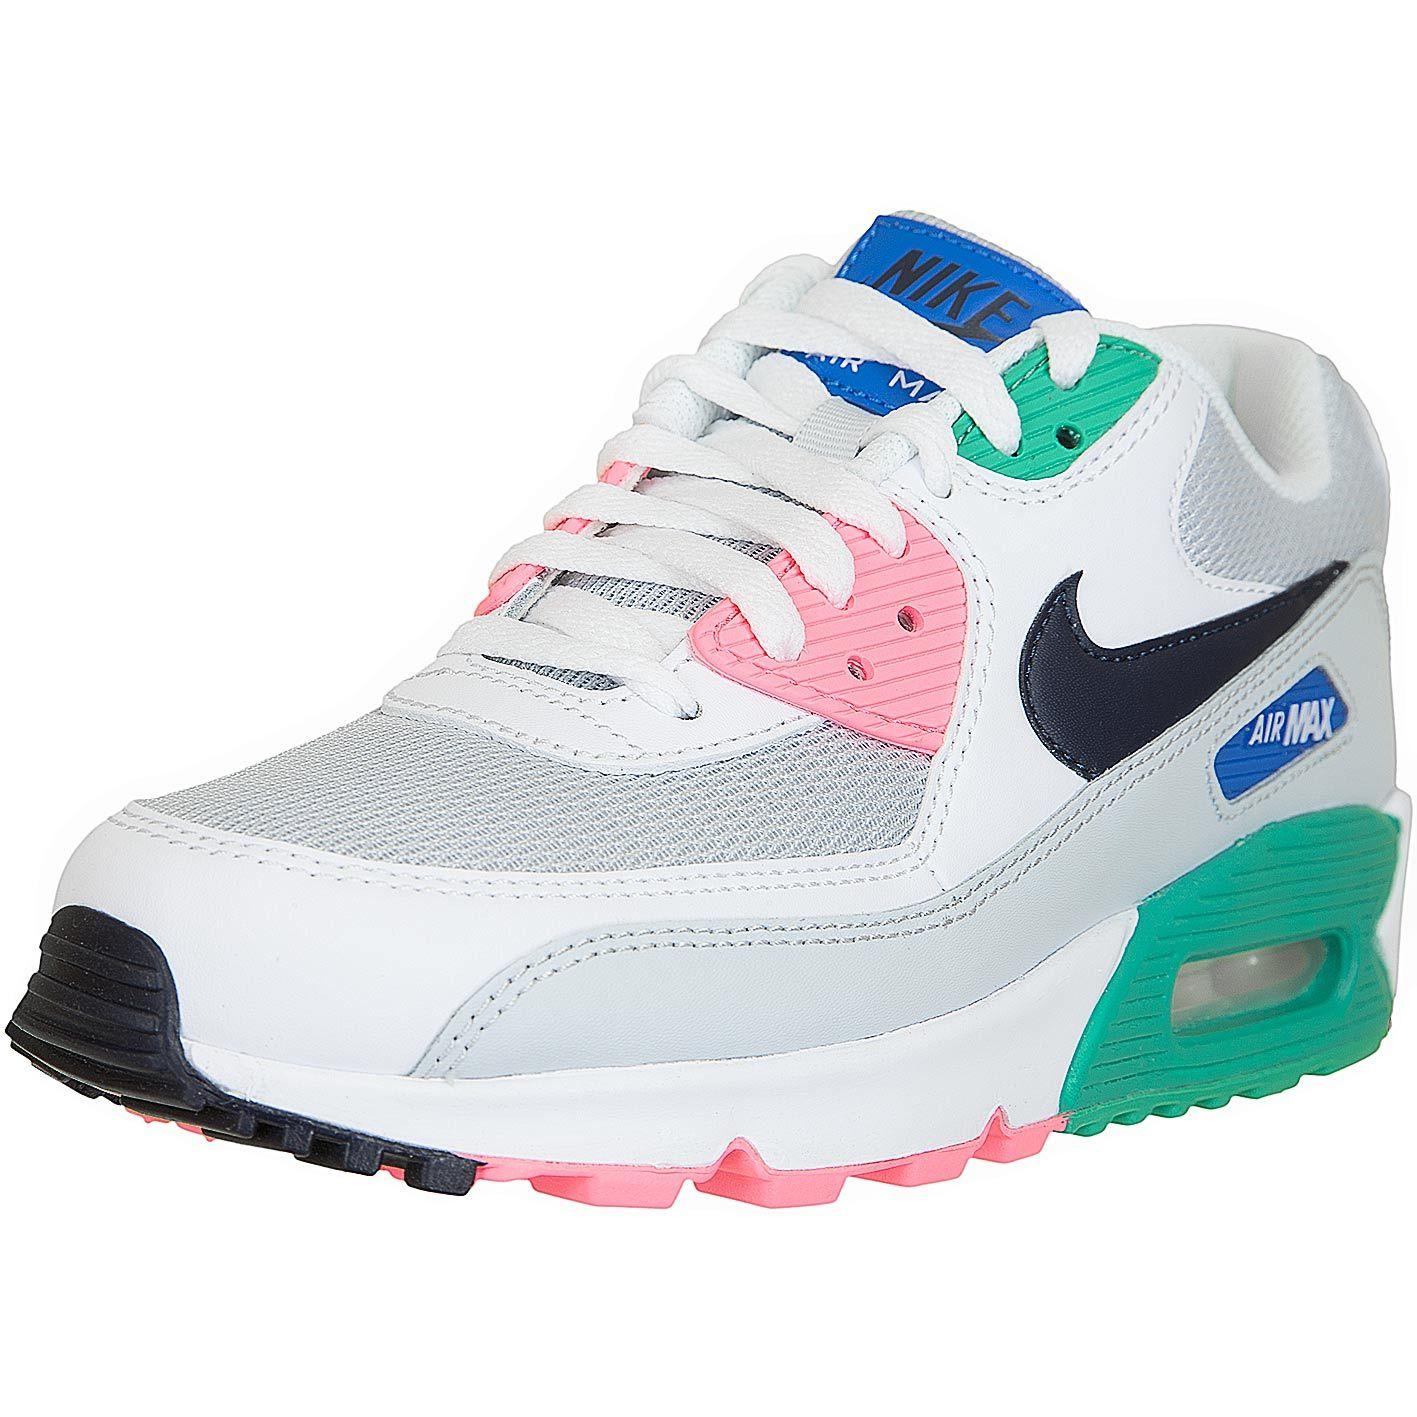 Nike Damen Sneaker Air Max 90 Essential Weiss Pink Grun Hier Bestellen Nike Damen Sneaker Nike Damen Sneaker